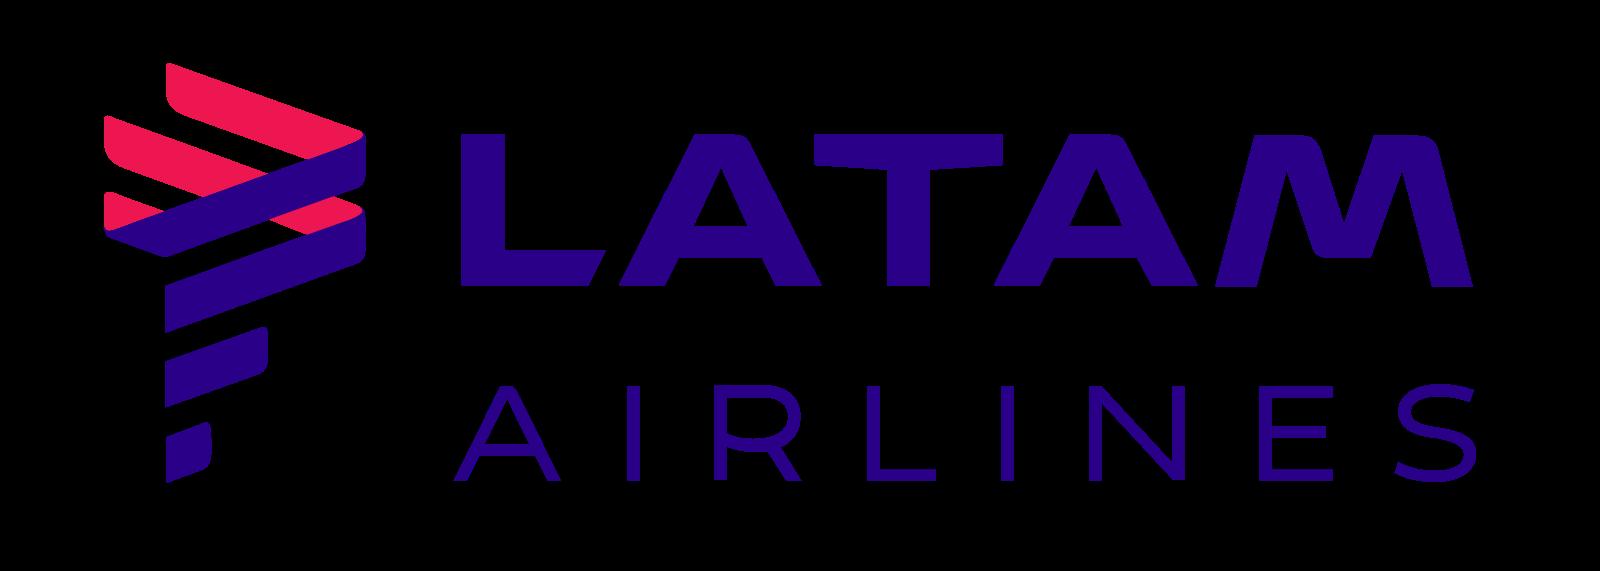 latam logo 15 - Latam Airlines Logo